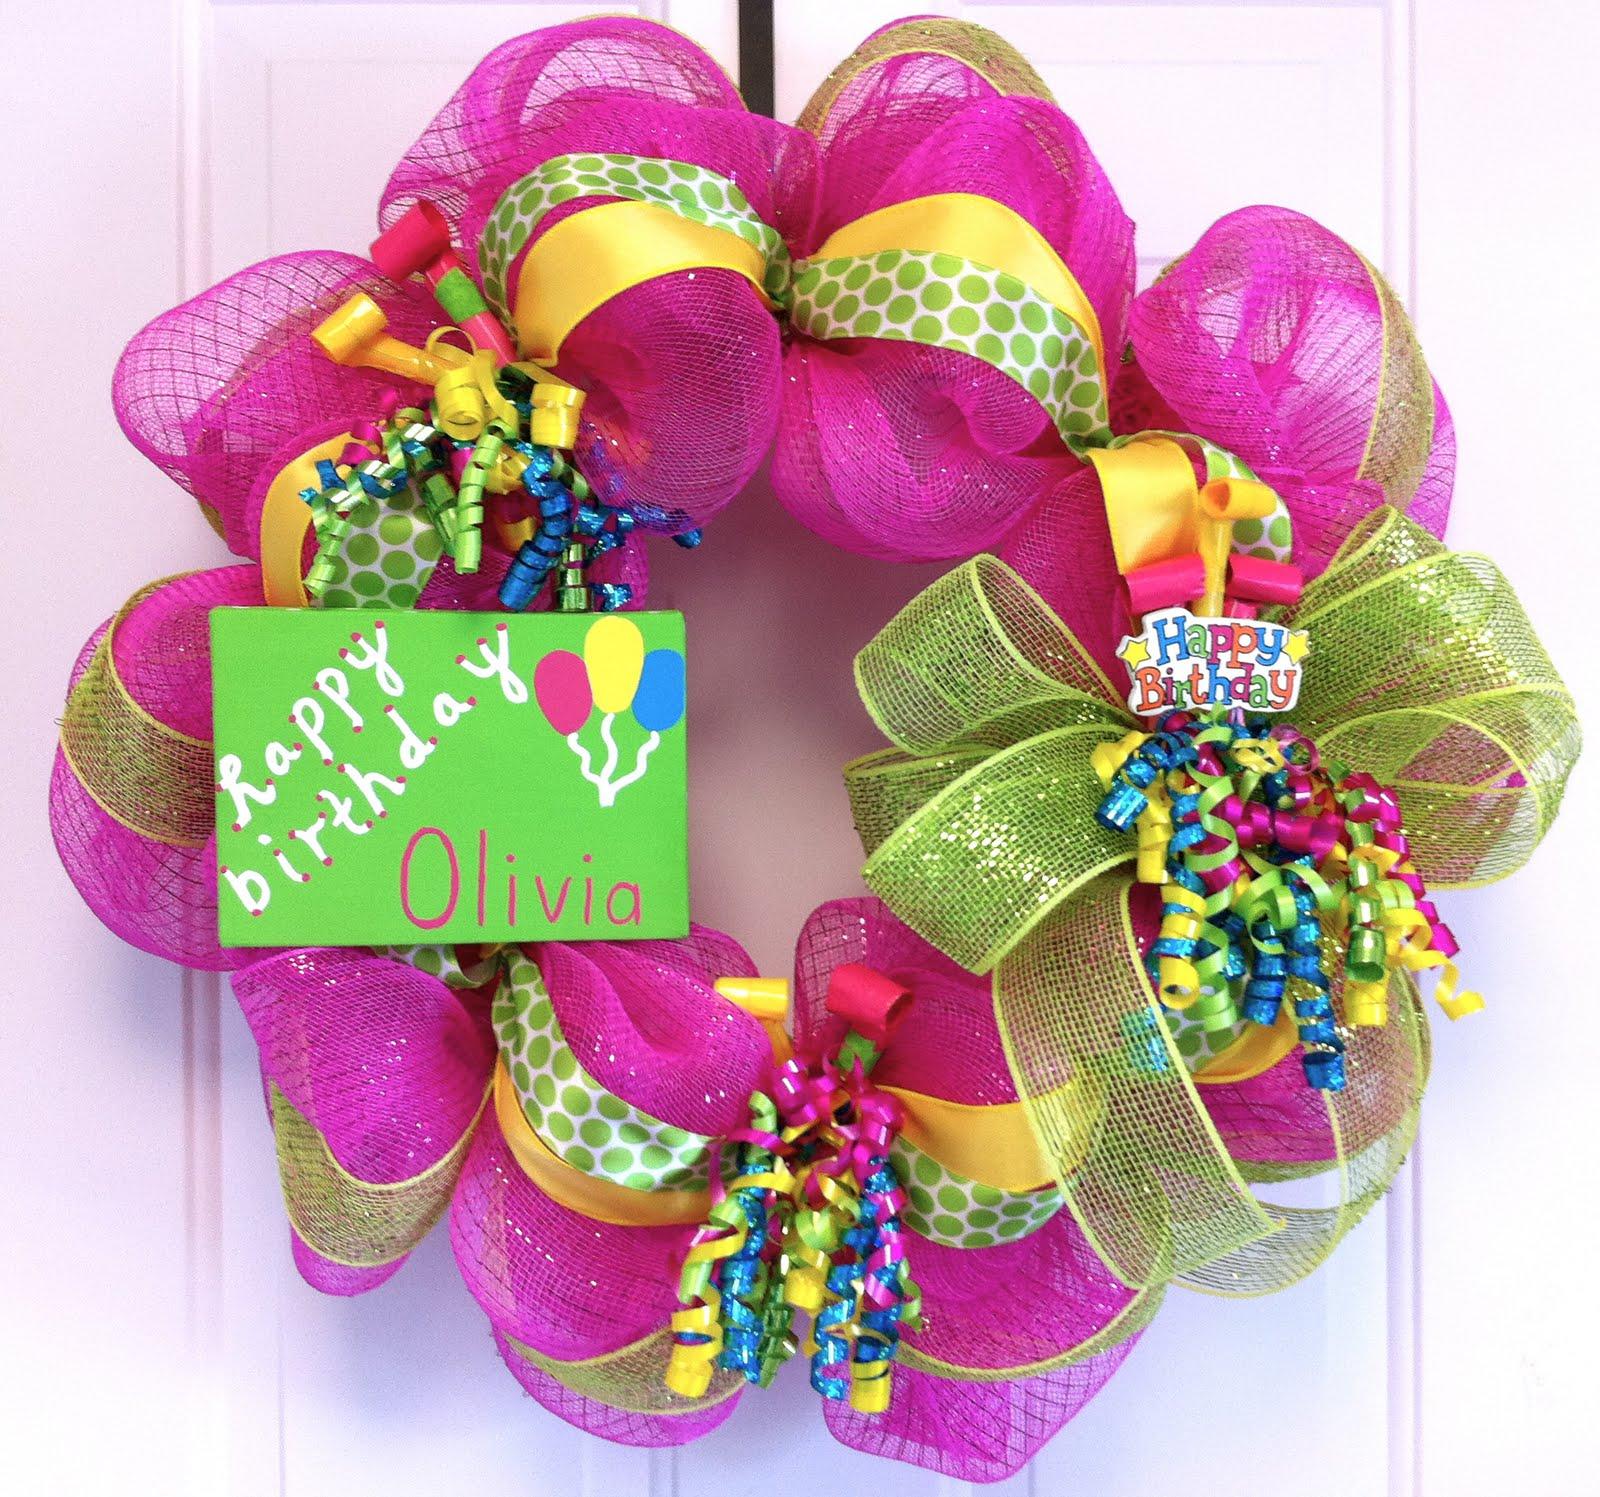 Dazzling Designs By Brittany Happy Birthday Olivia